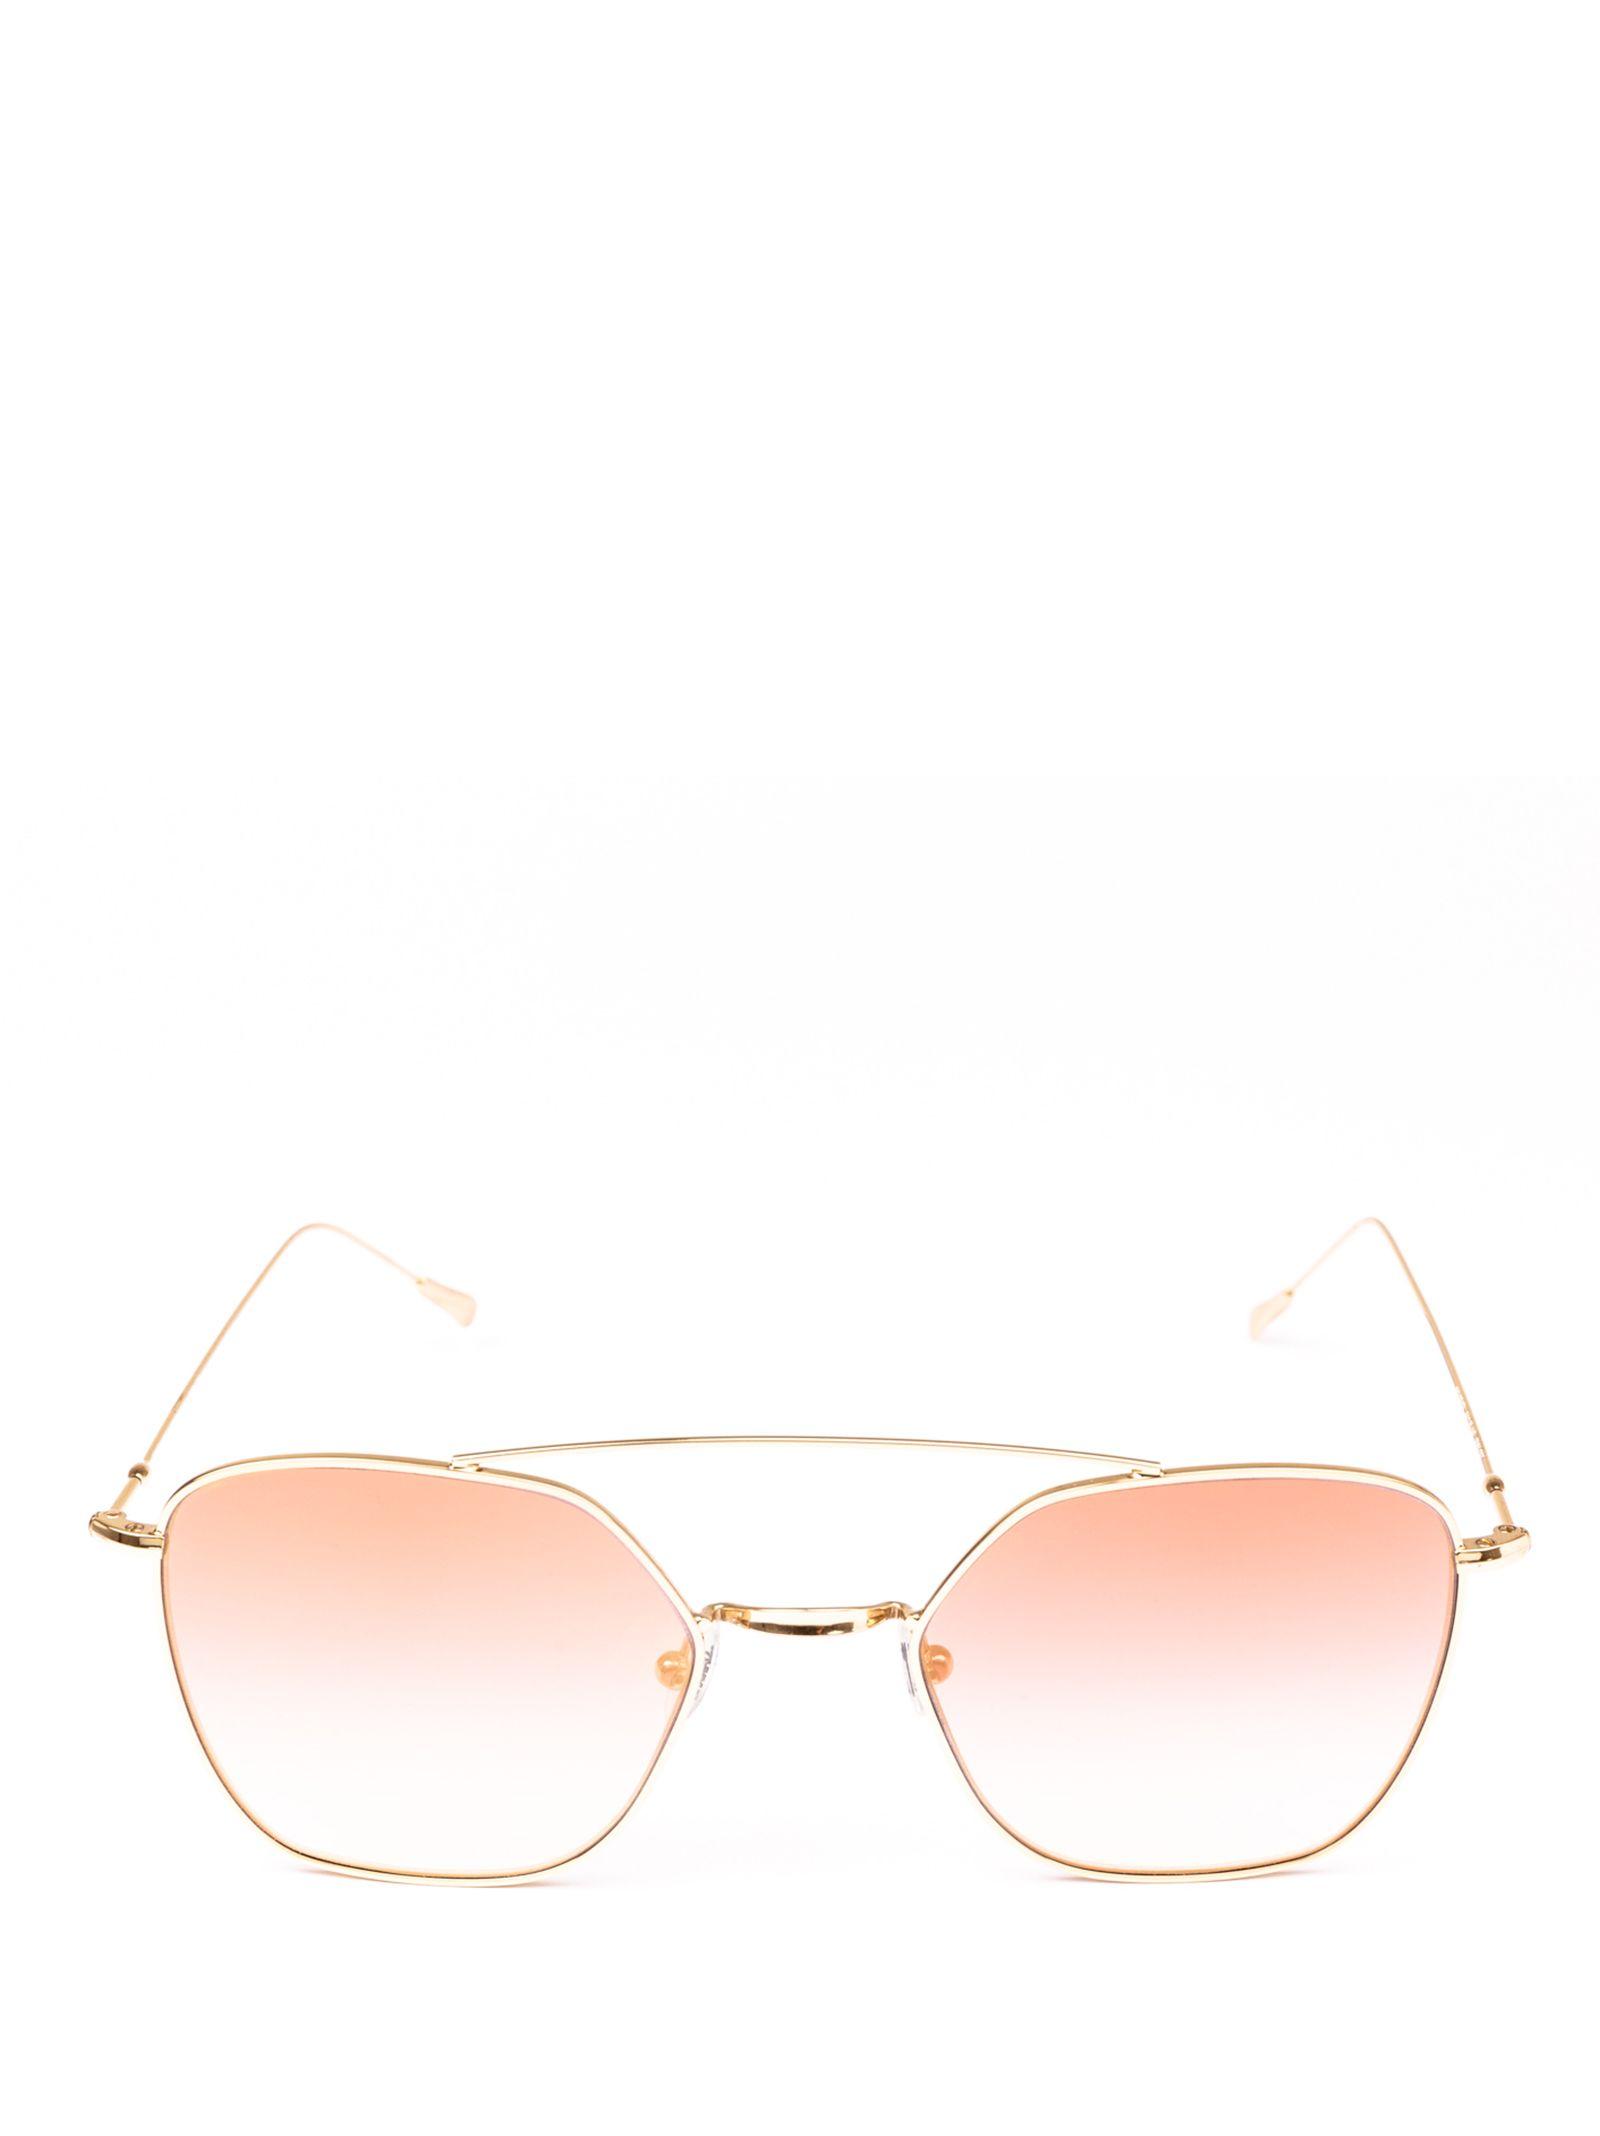 SPEKTRE Sunglasses in Dv01Aft